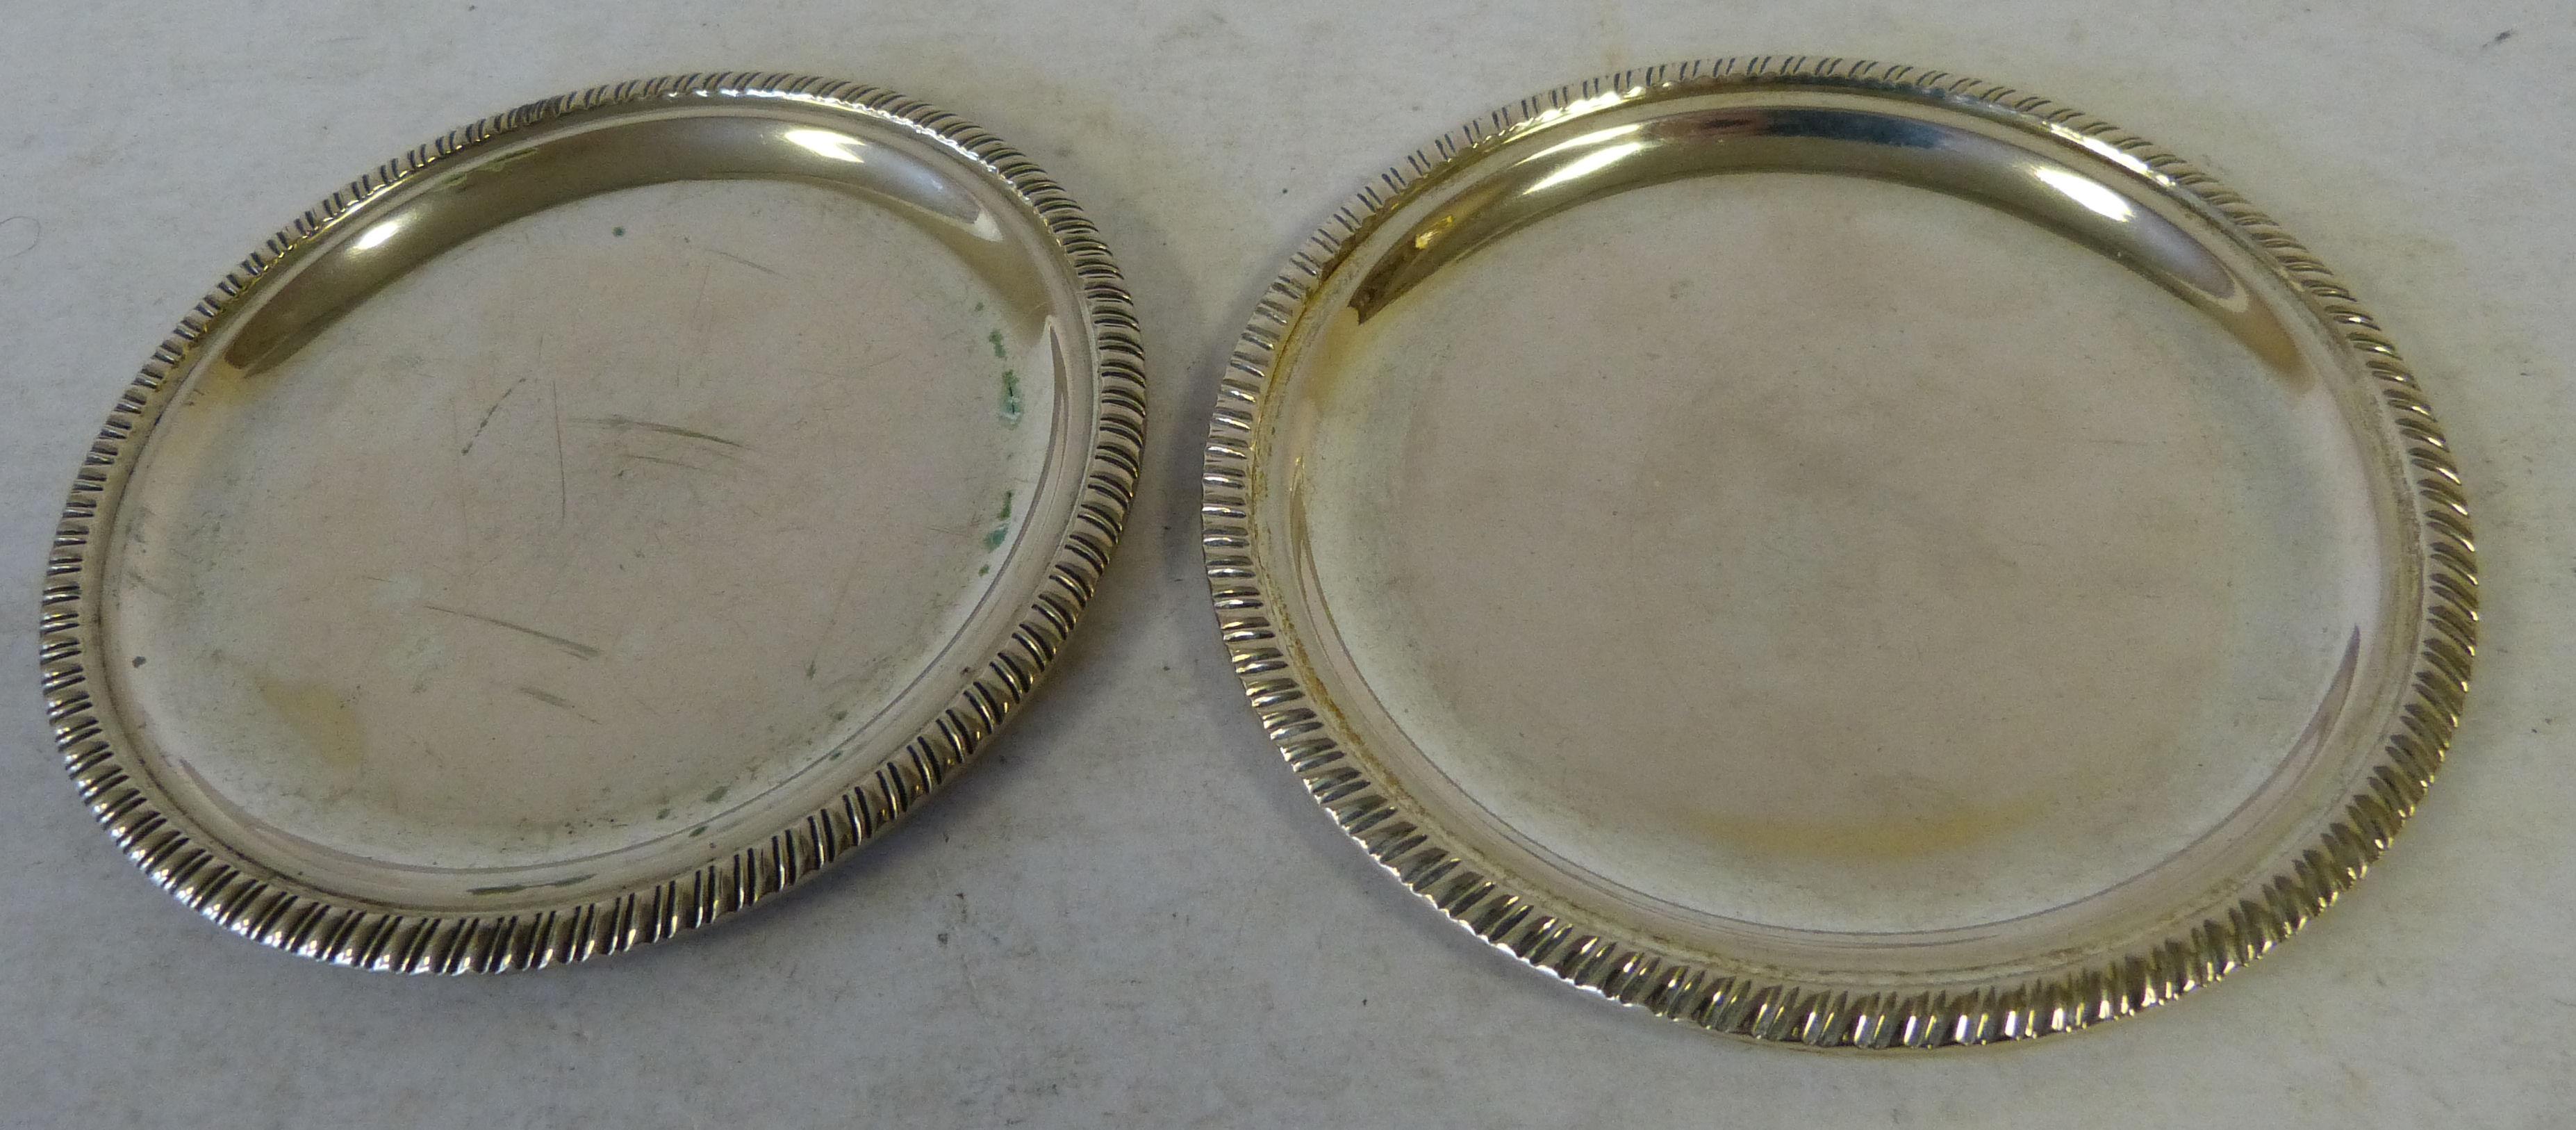 A Pair of 800 Silver Coloured Metal Coasters having gadroon rims, engraved ``Lions Club Boregomanero`` 3.2oz